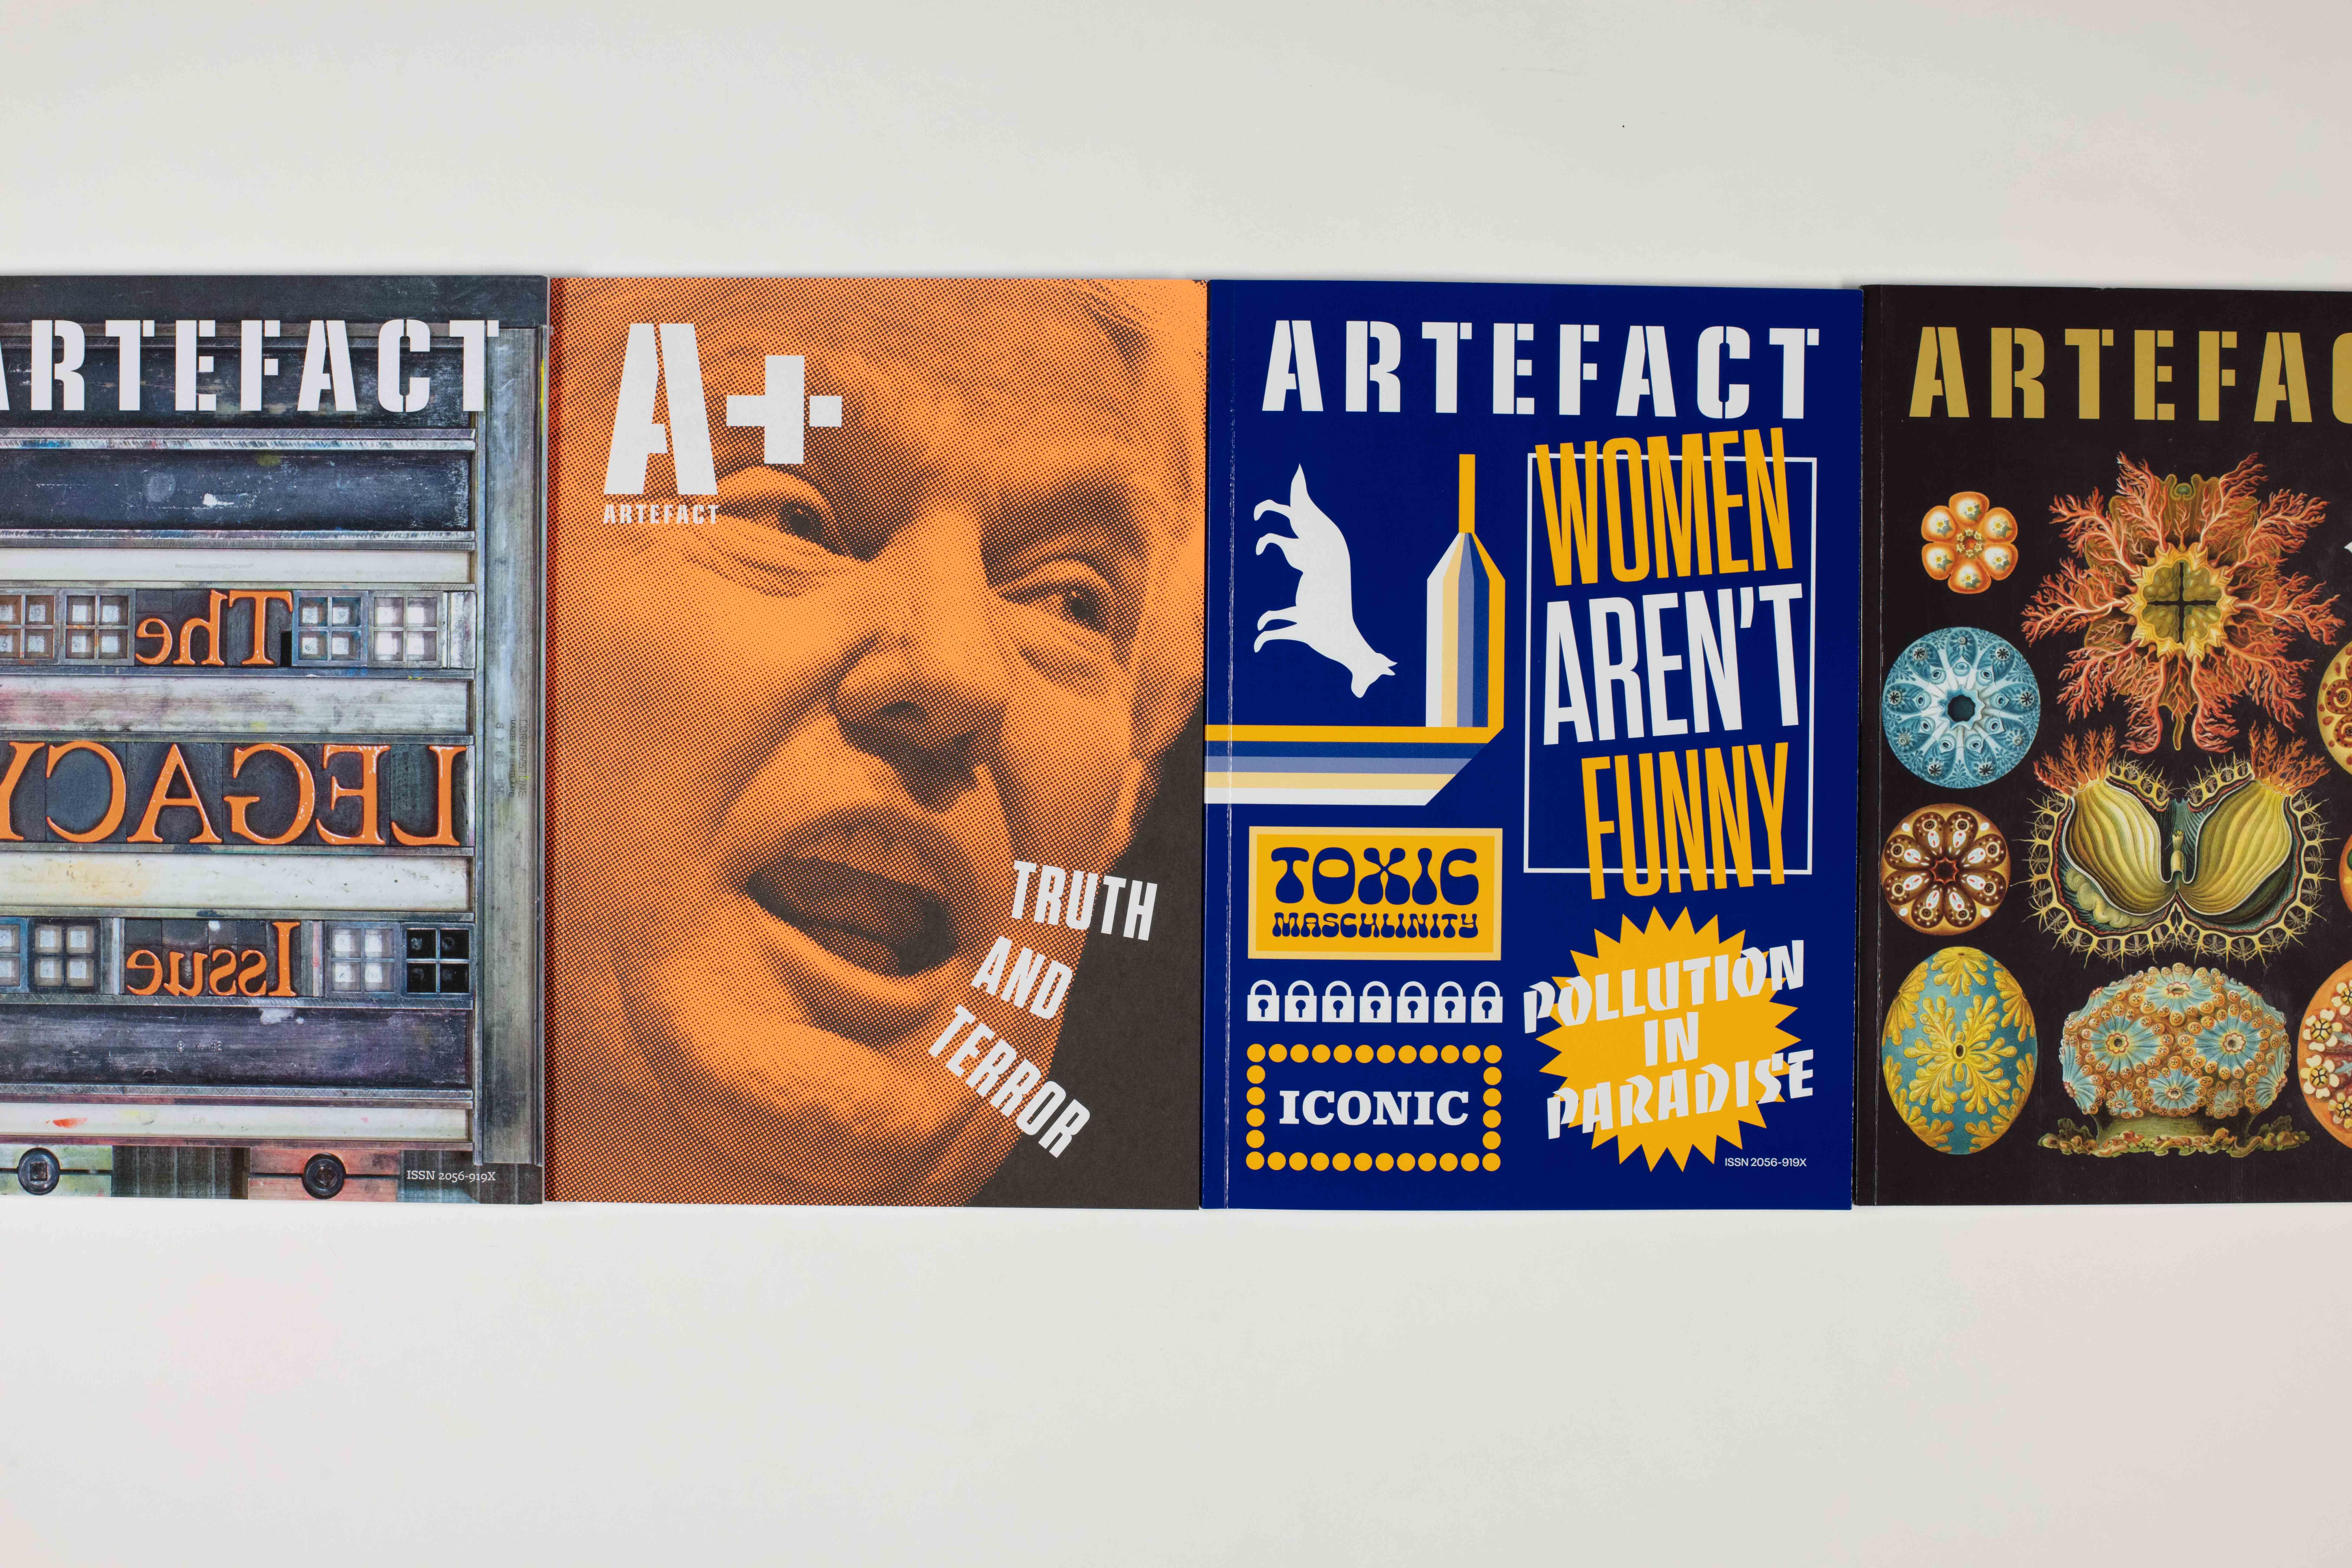 Artefact magazine